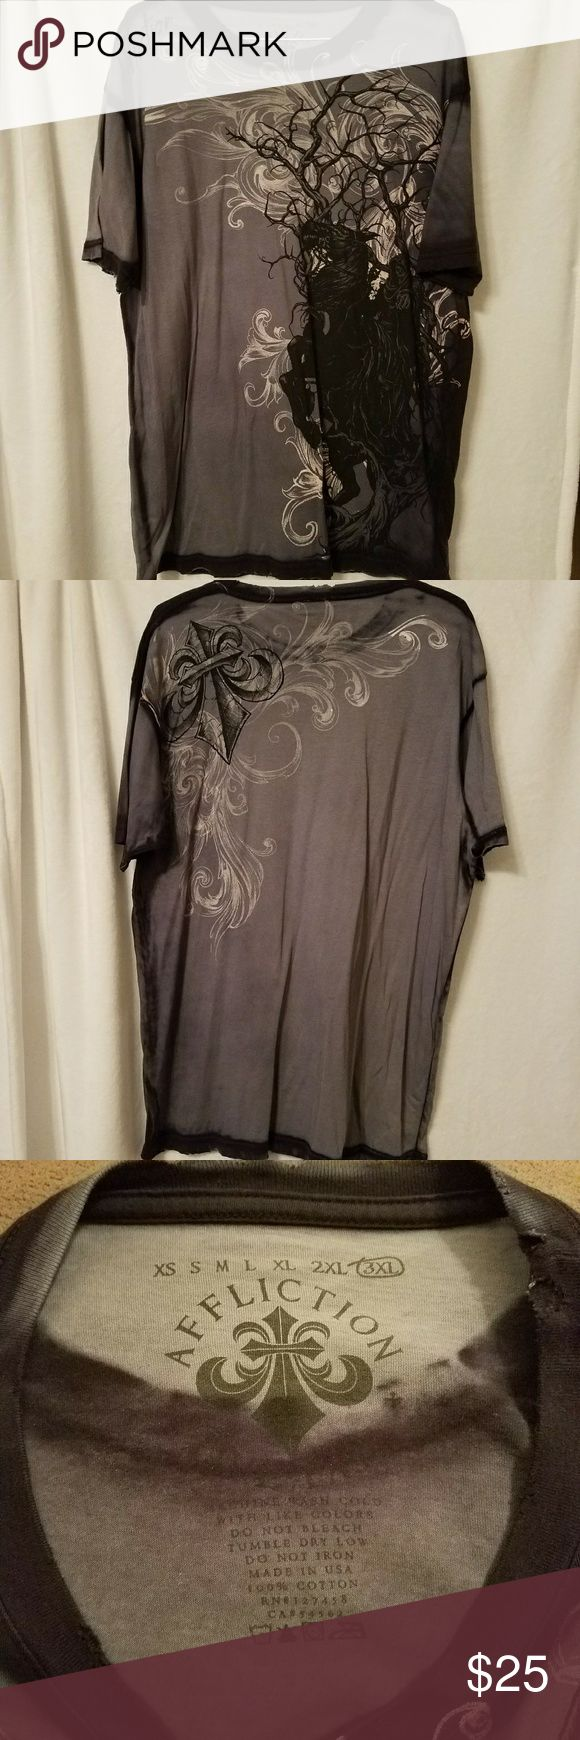 Affliction Men's Gray T-shirt 3XL Affliction Men's Gray T-shirt.  Size 3XL.  Shirt is black,  gray,  tan.  100% cotton. Affliction Shirts Tees - Short Sleeve